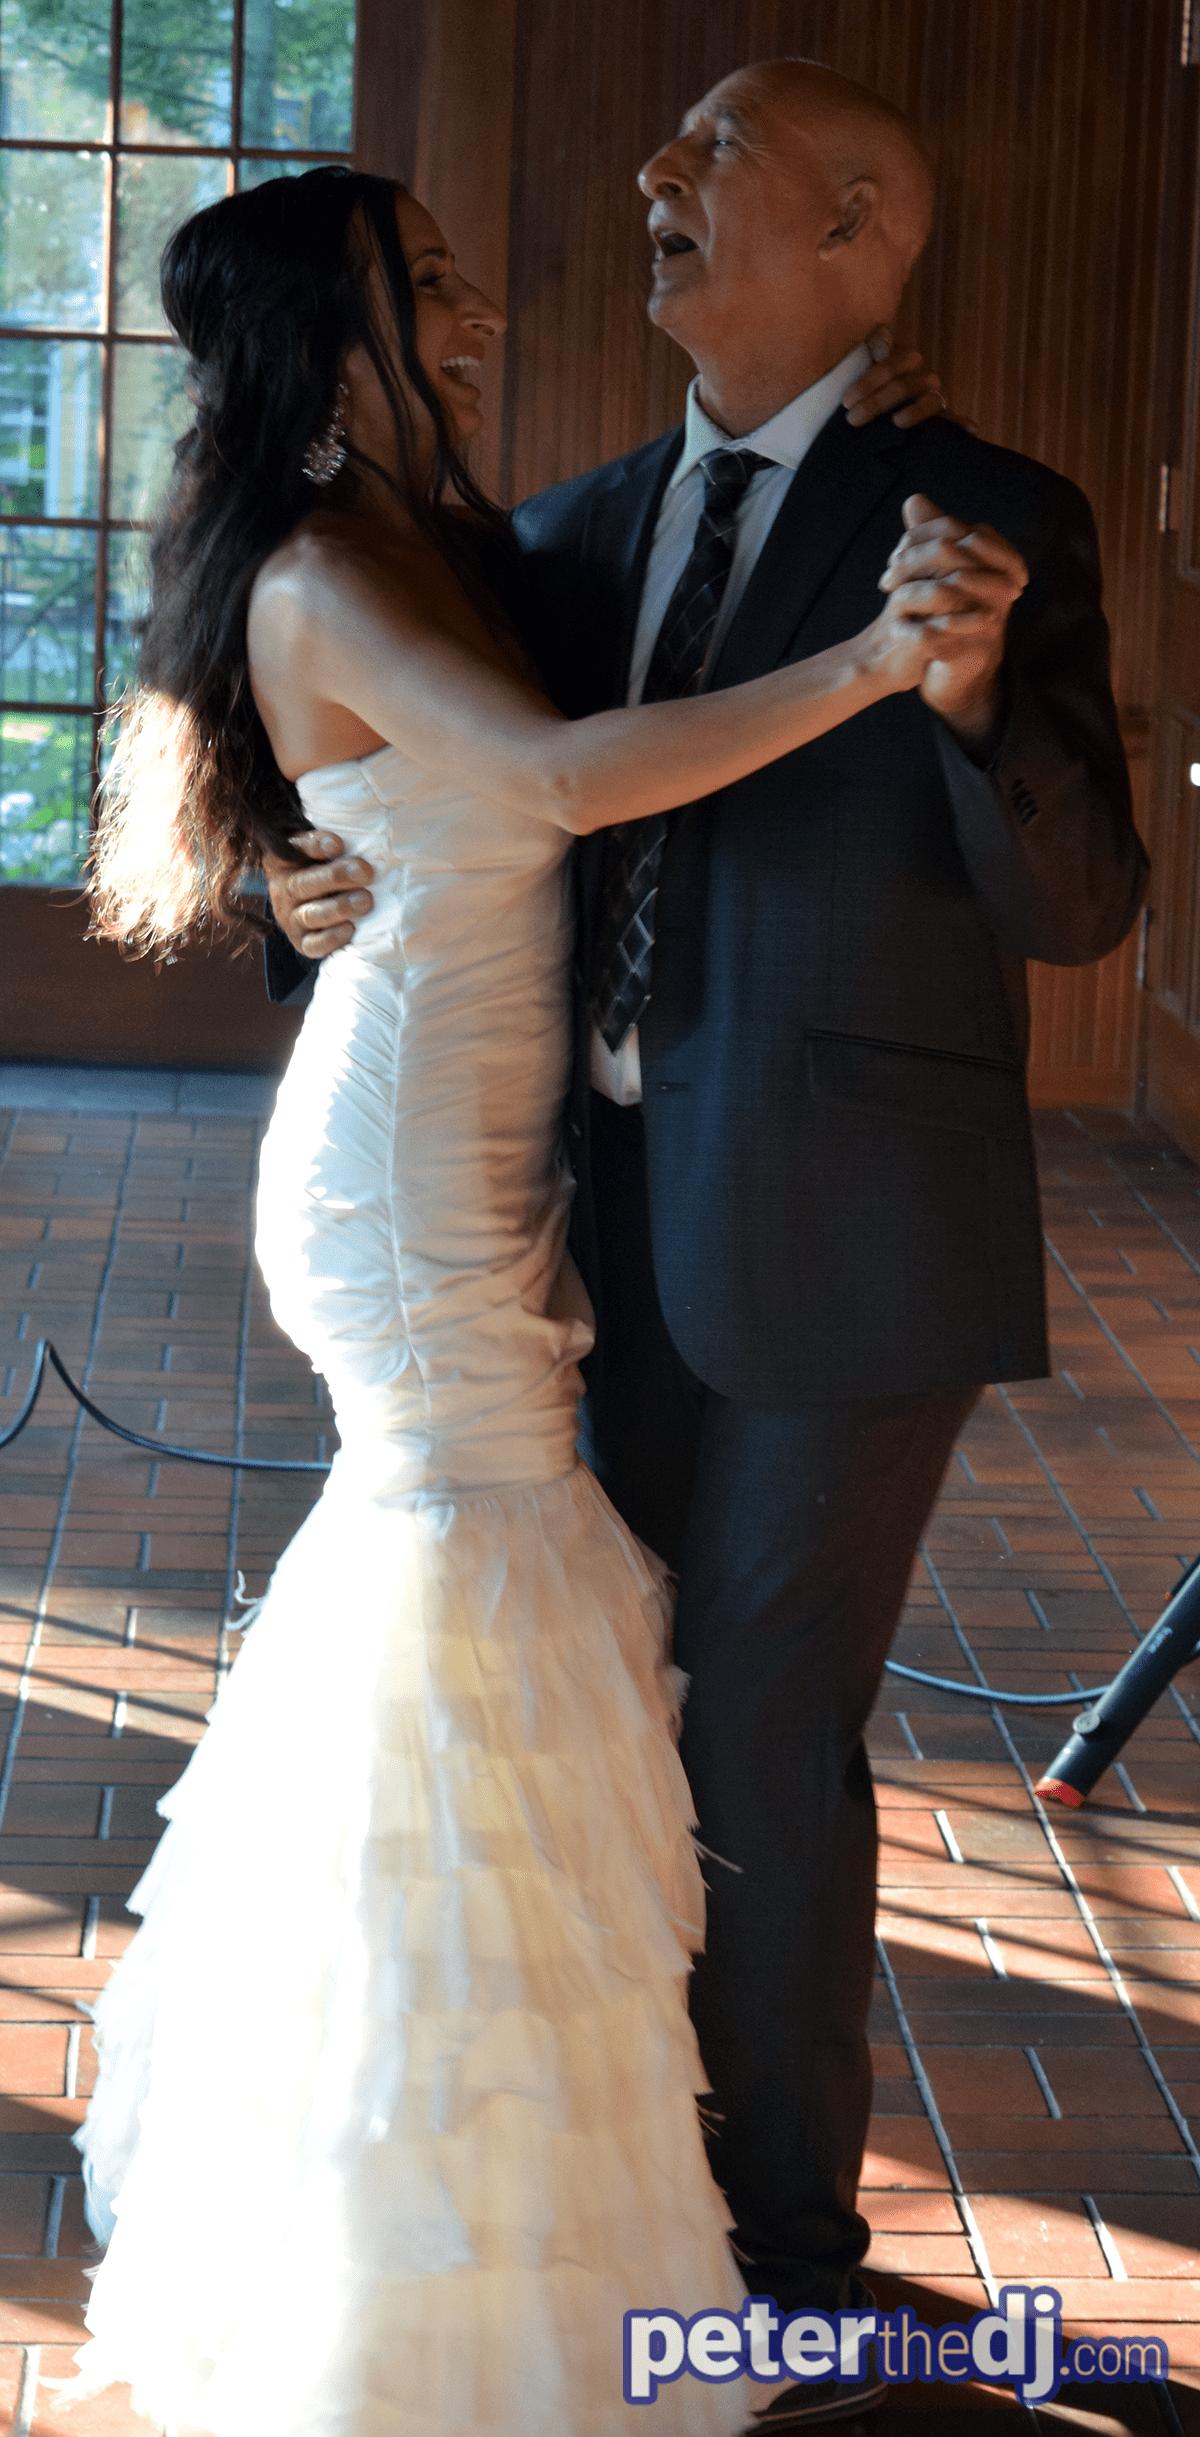 Wedding: Jenna and David at Sherwood Inn, Skaneateles, 7/10/21 8